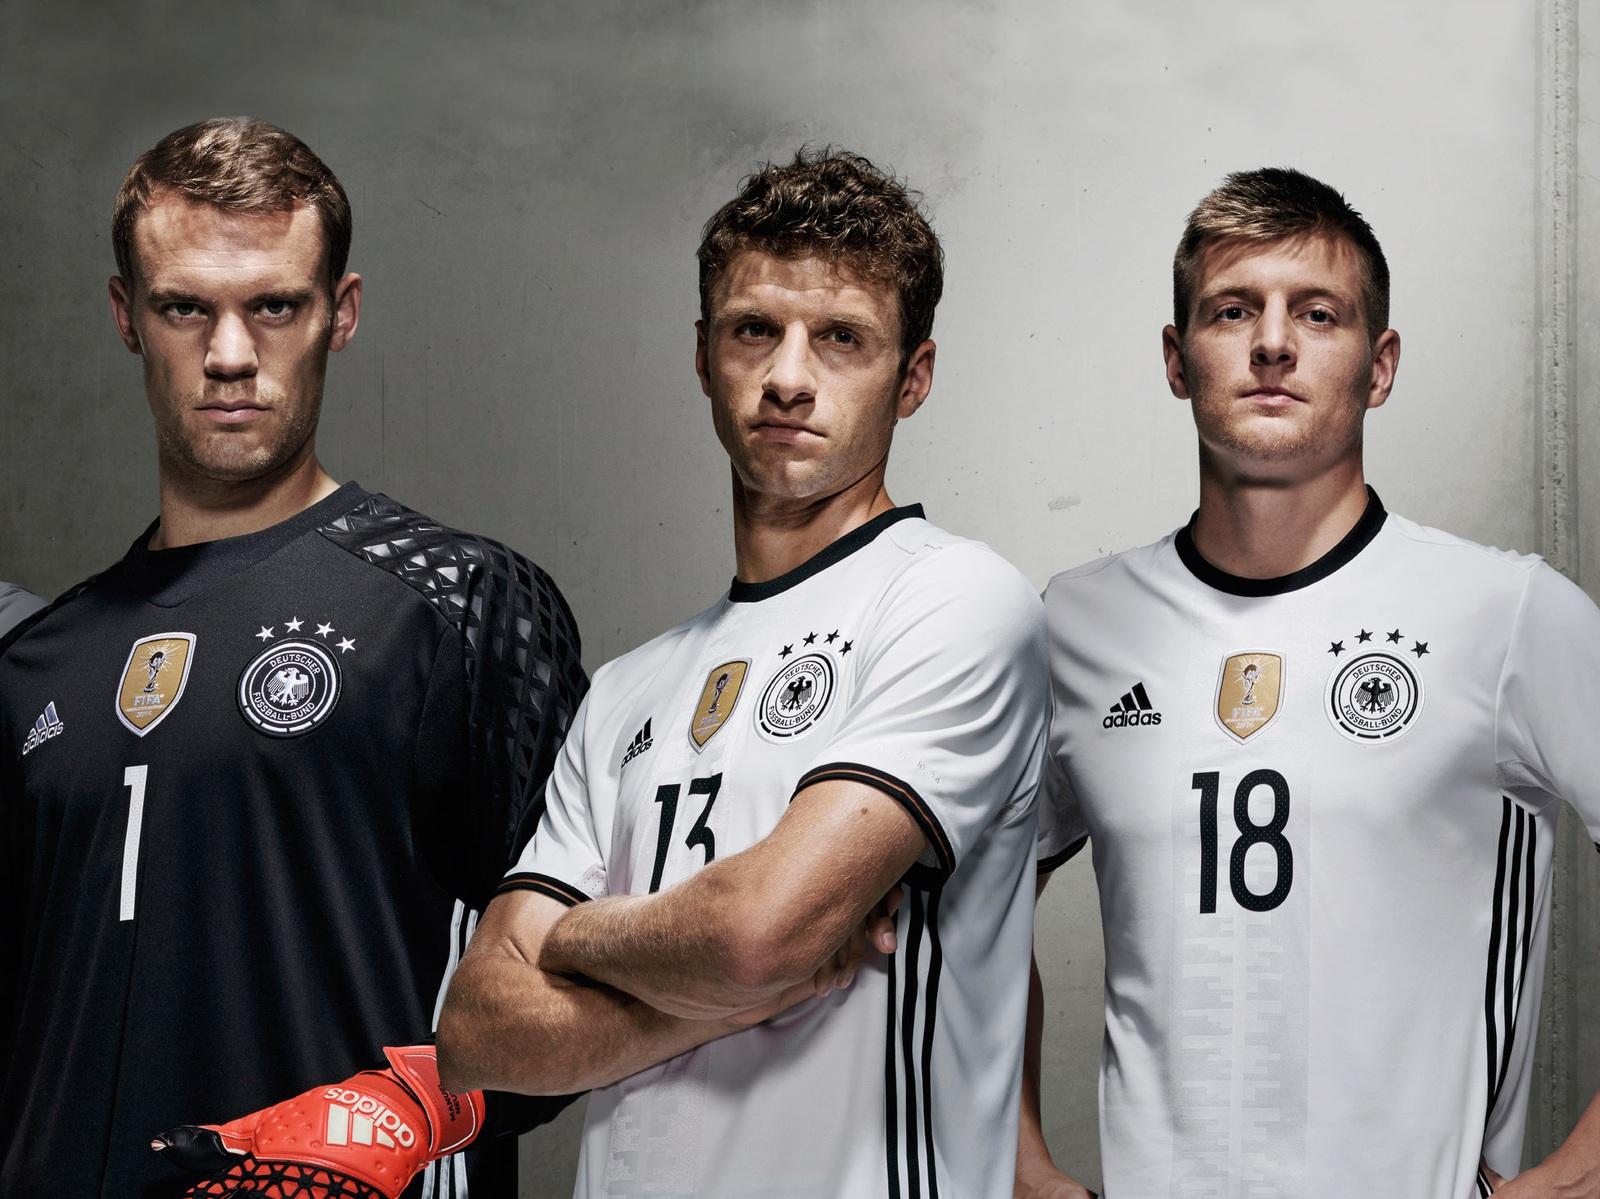 adidas Trikots für den DFB Stützpunkt | Gothaer | Sponsor